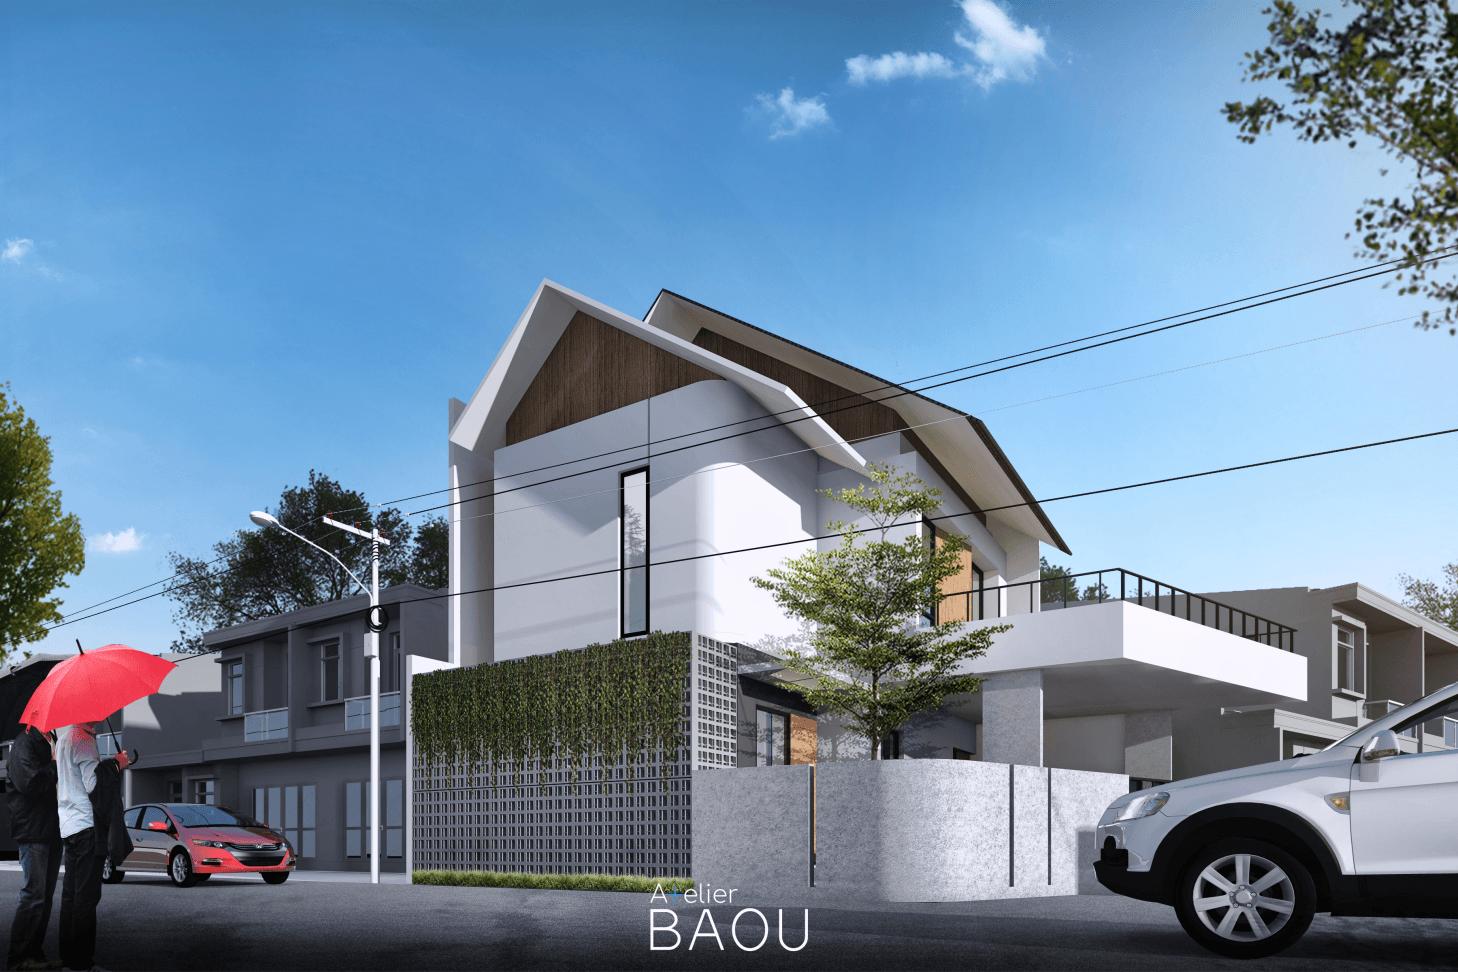 Atelier Baou Yt House Tangerang, Kota Tangerang, Banten, Indonesia Tangerang, Kota Tangerang, Banten, Indonesia Atelier-Baou-Yt-House   86495